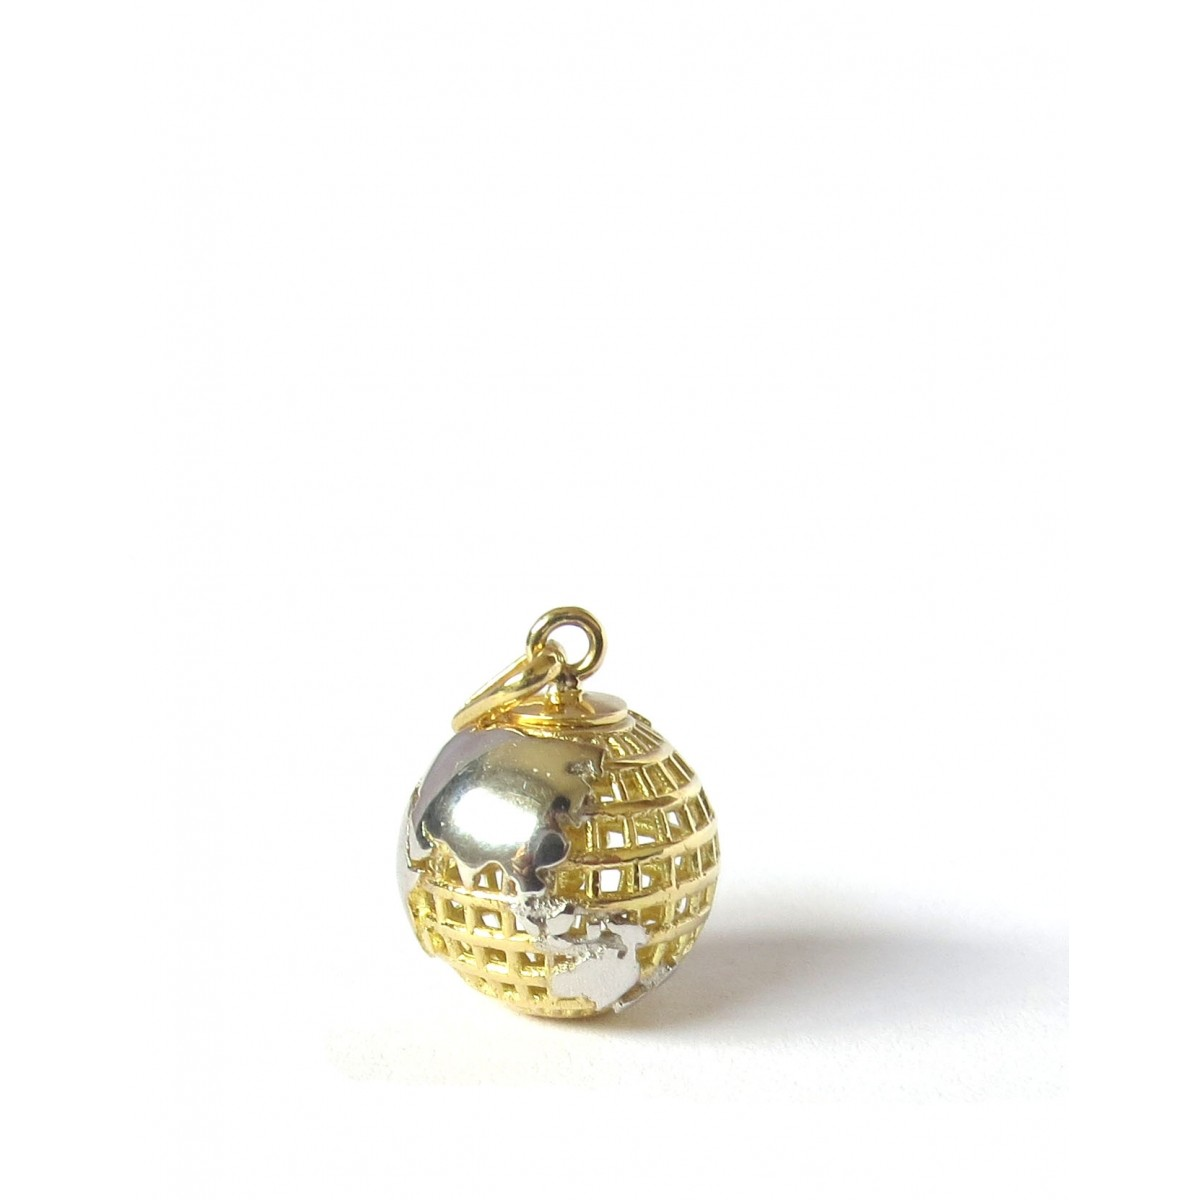 Pingente Globo Terrestre Ouro 18k - Tamanho Pequeno  - Sancy